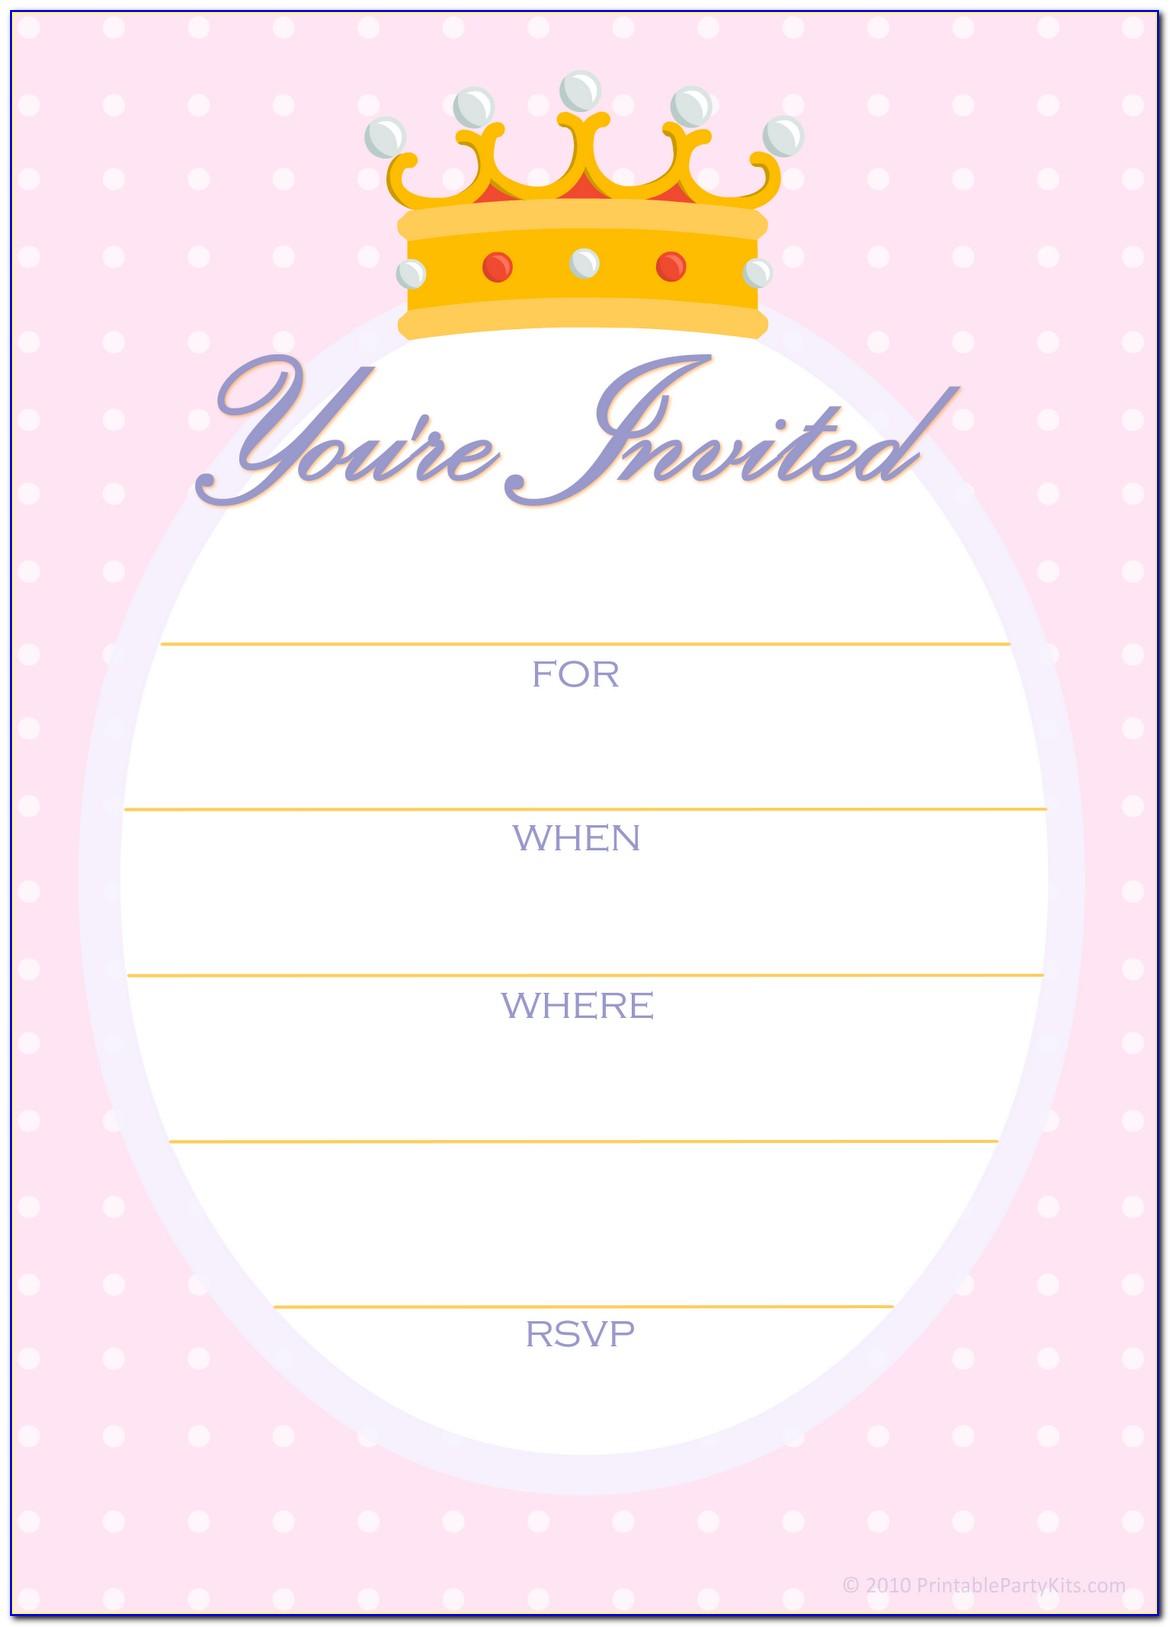 Designs For Invitation Cards